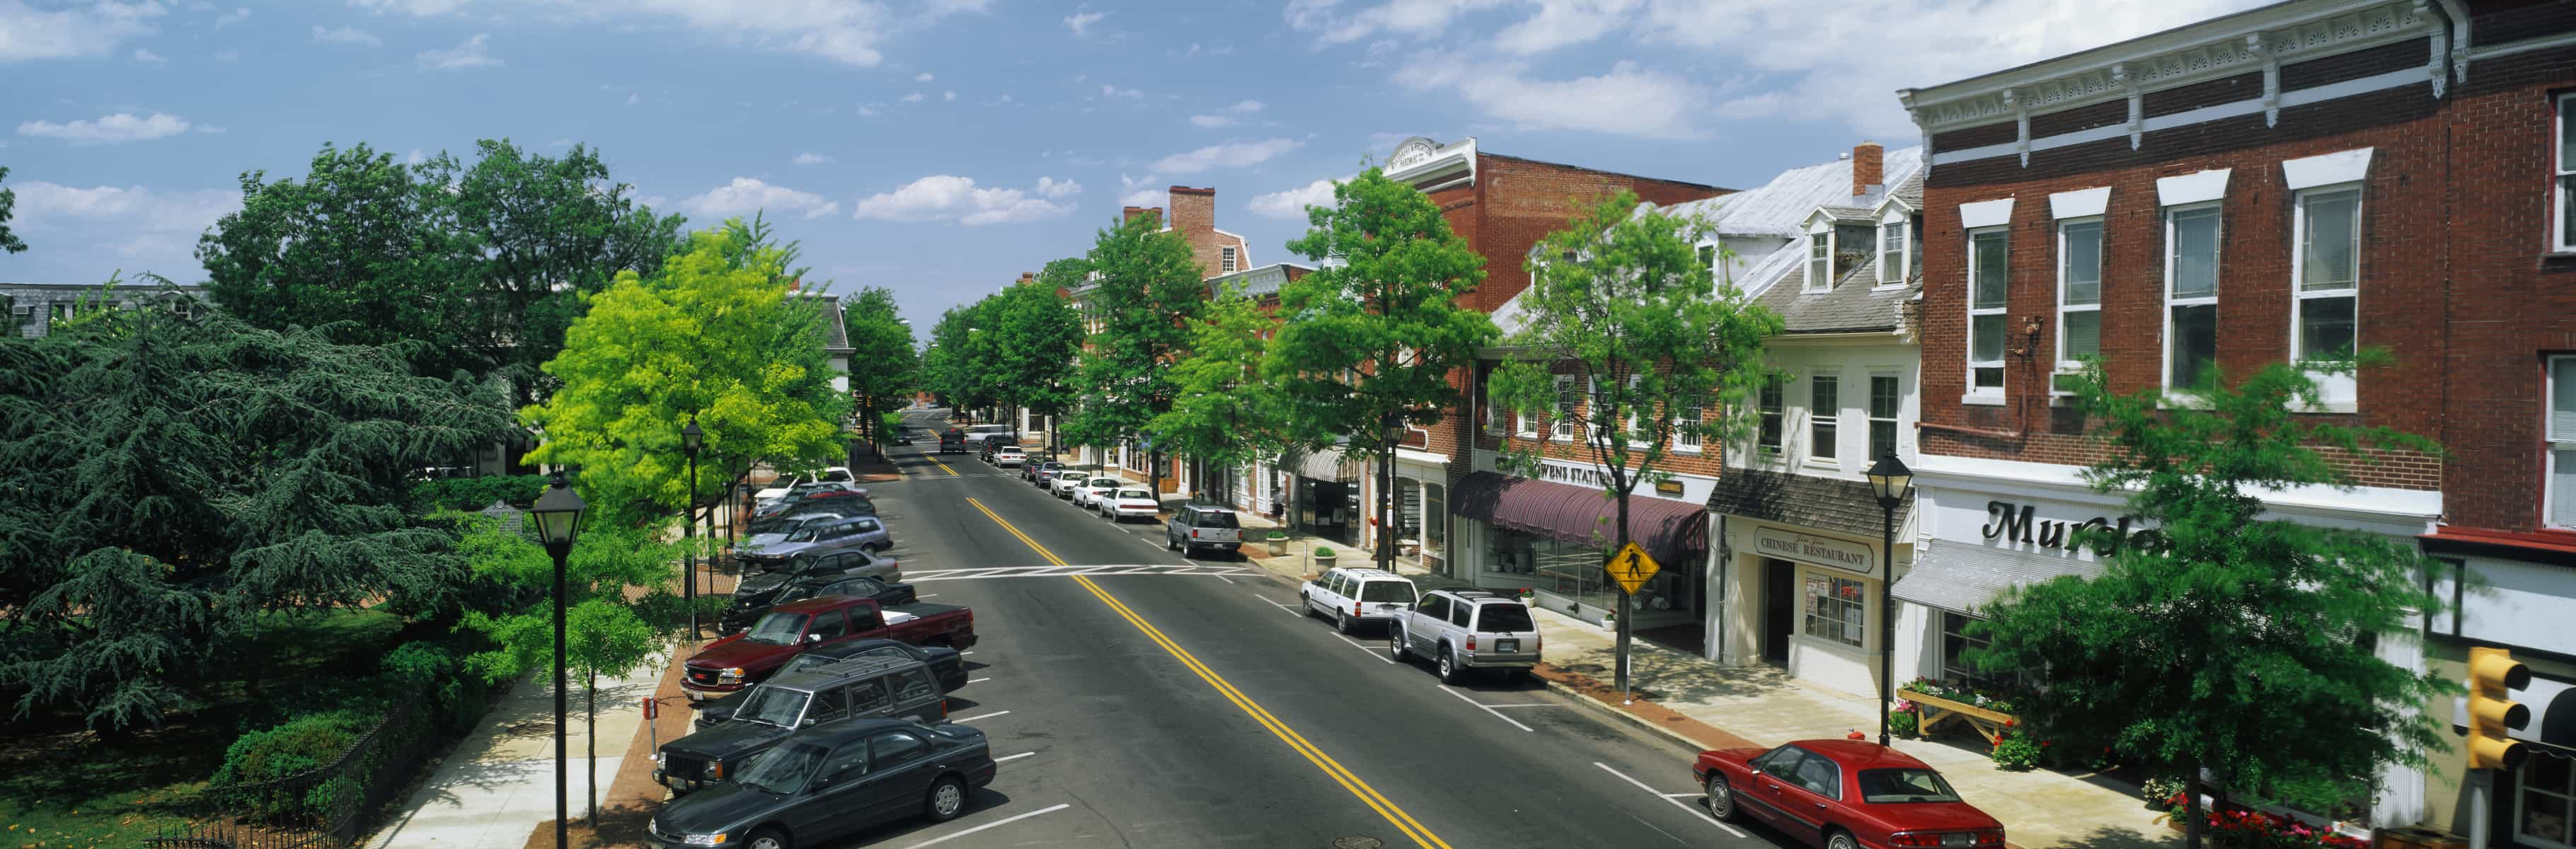 Image result for rural america main street